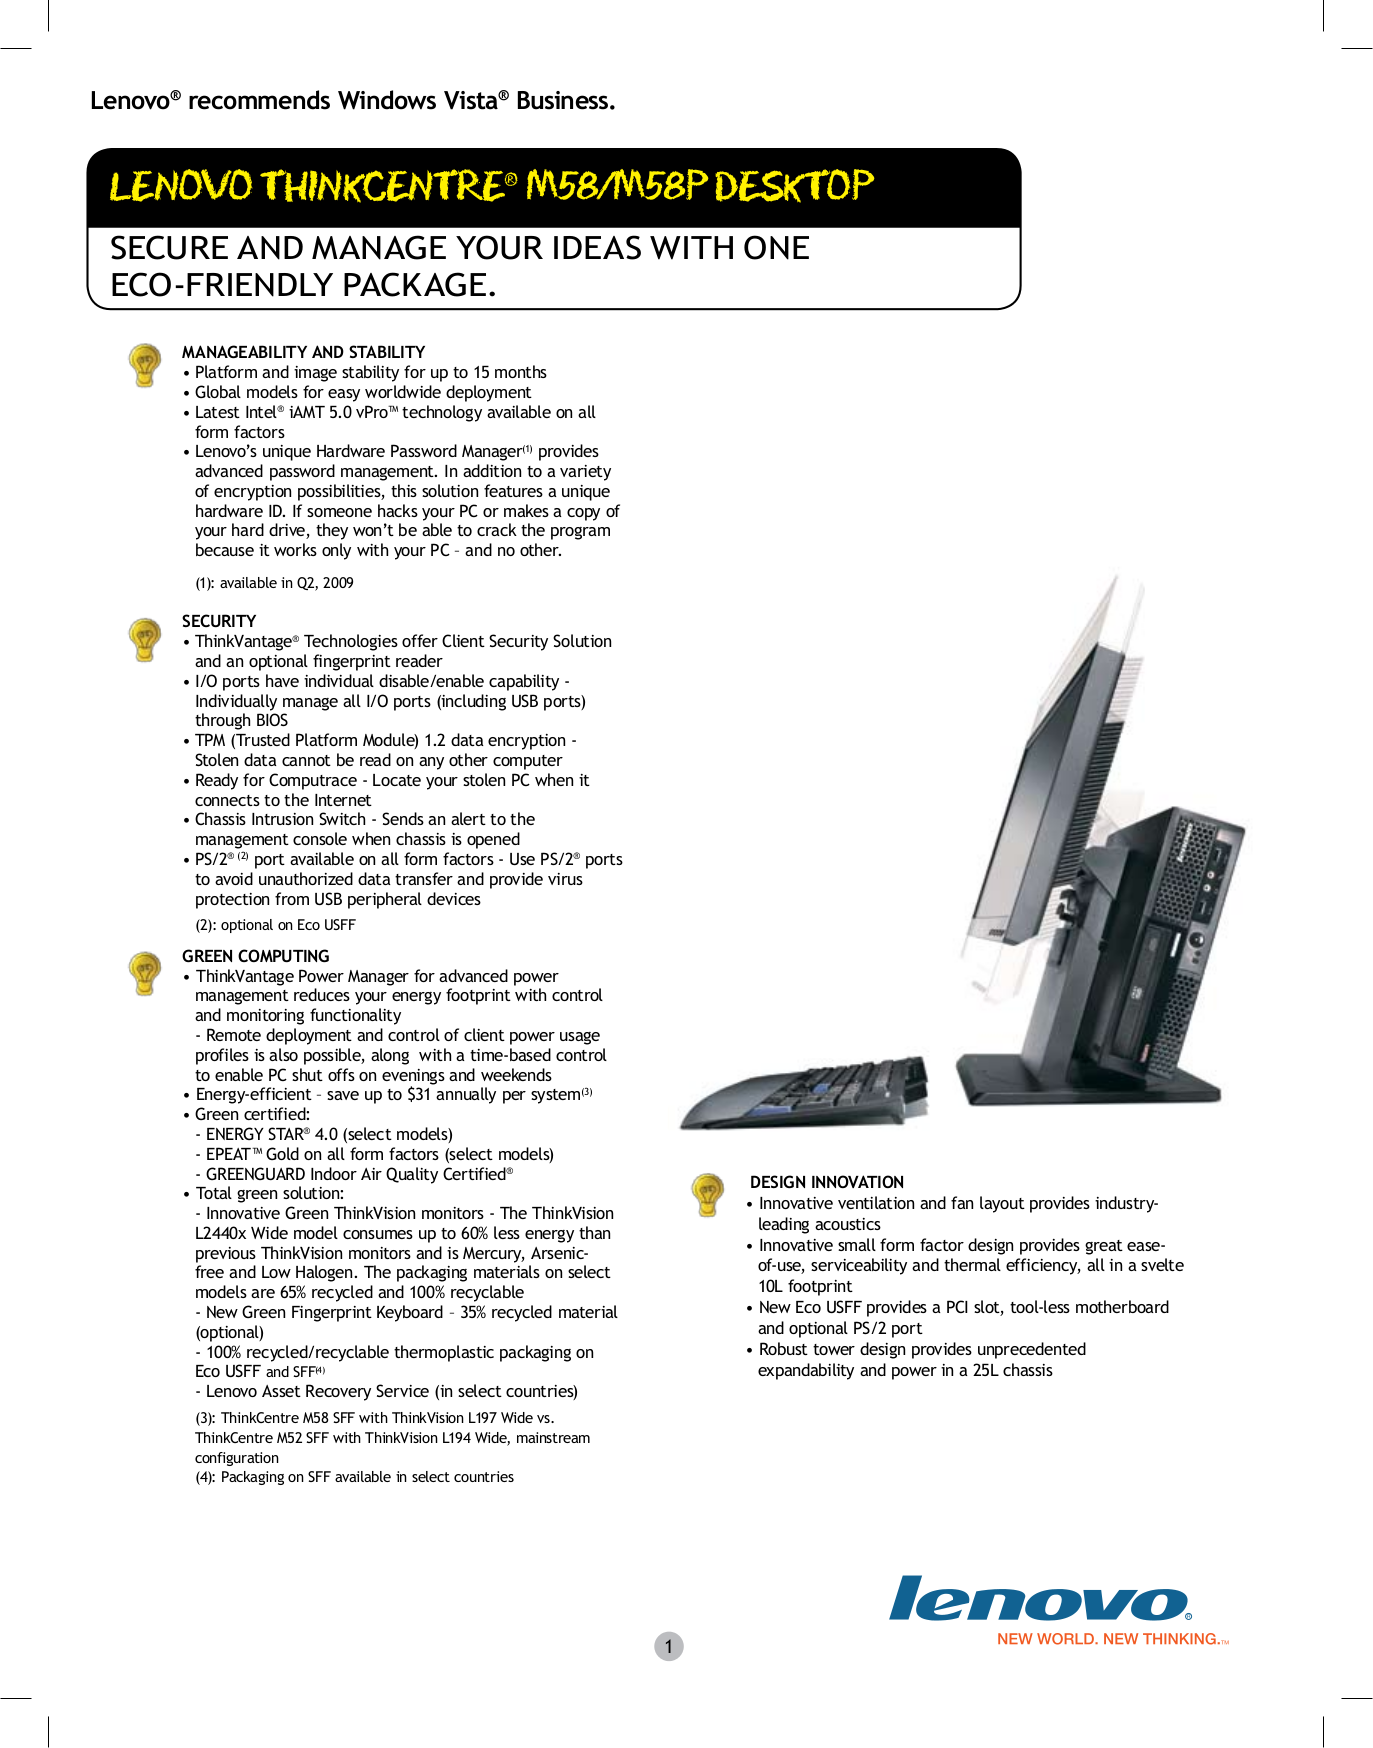 pdf for Lenovo Desktop ThinkCentre M58p 7479 manual